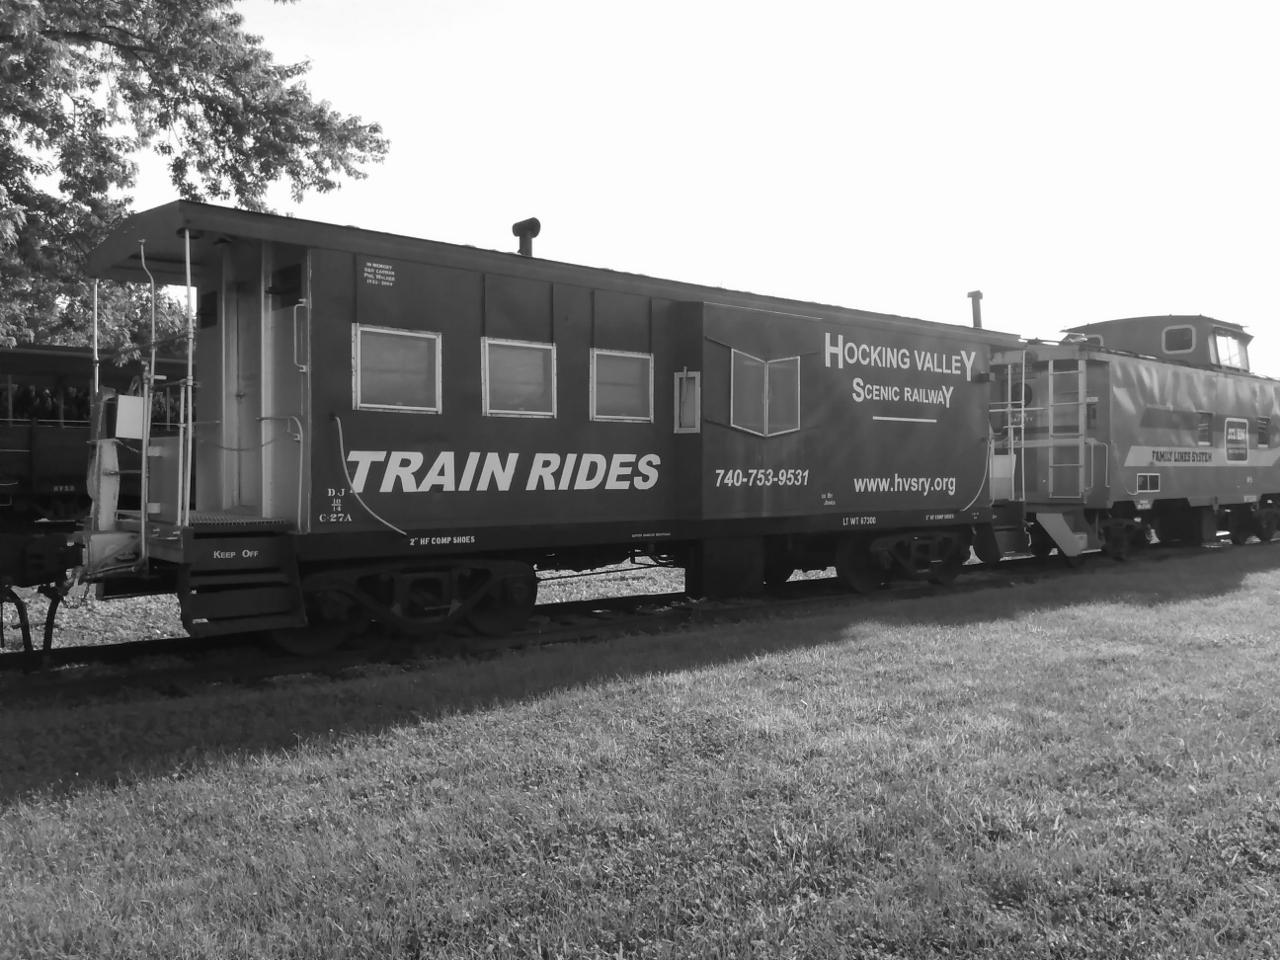 Hocking Valley Scenic Railway - BW 6-15-2018 6-40-34 AM